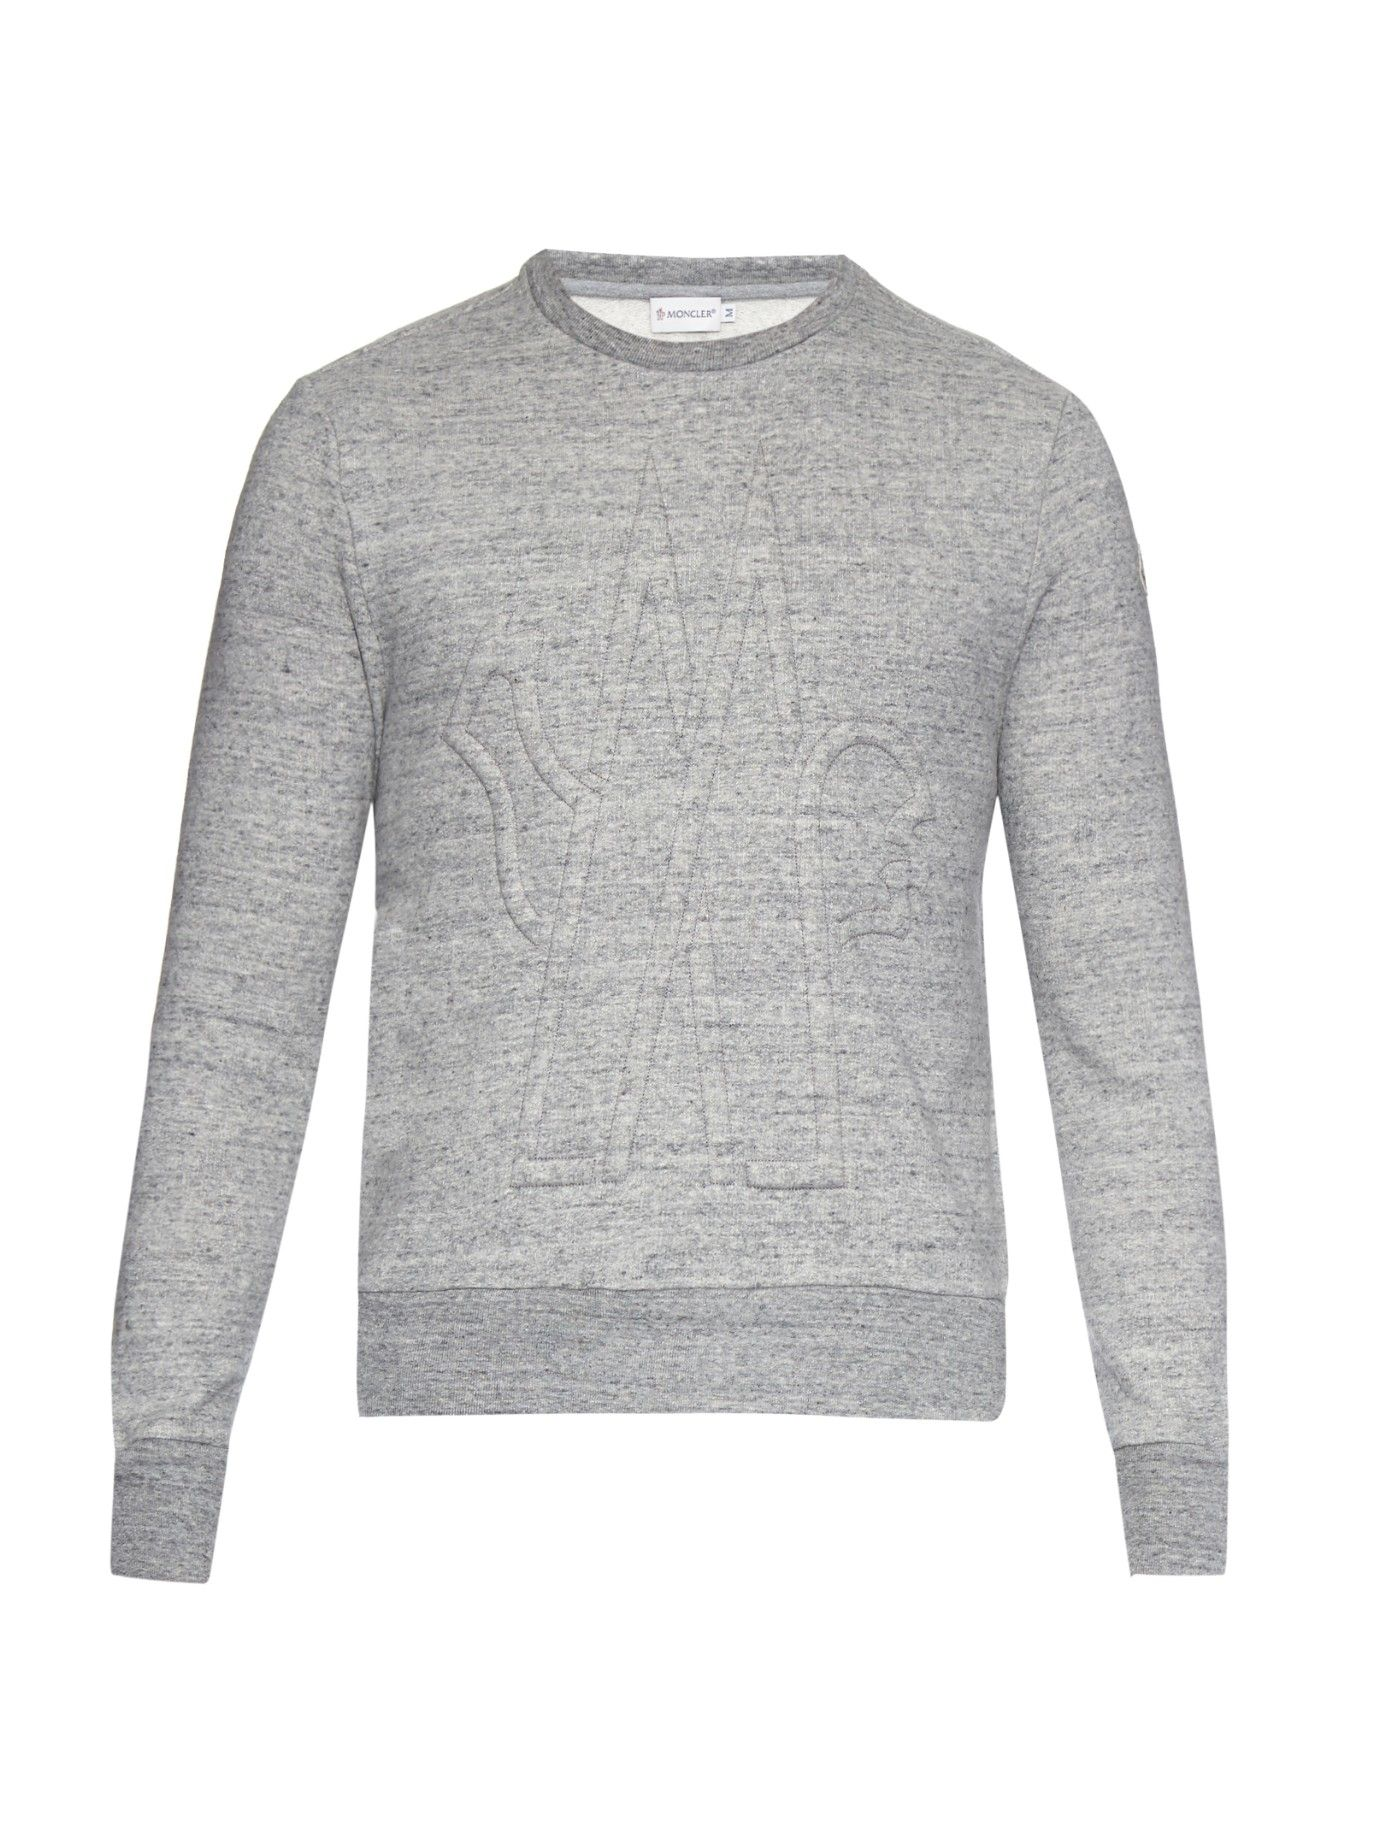 06aeec7c21a5 3D-logo embroidered sweatshirt